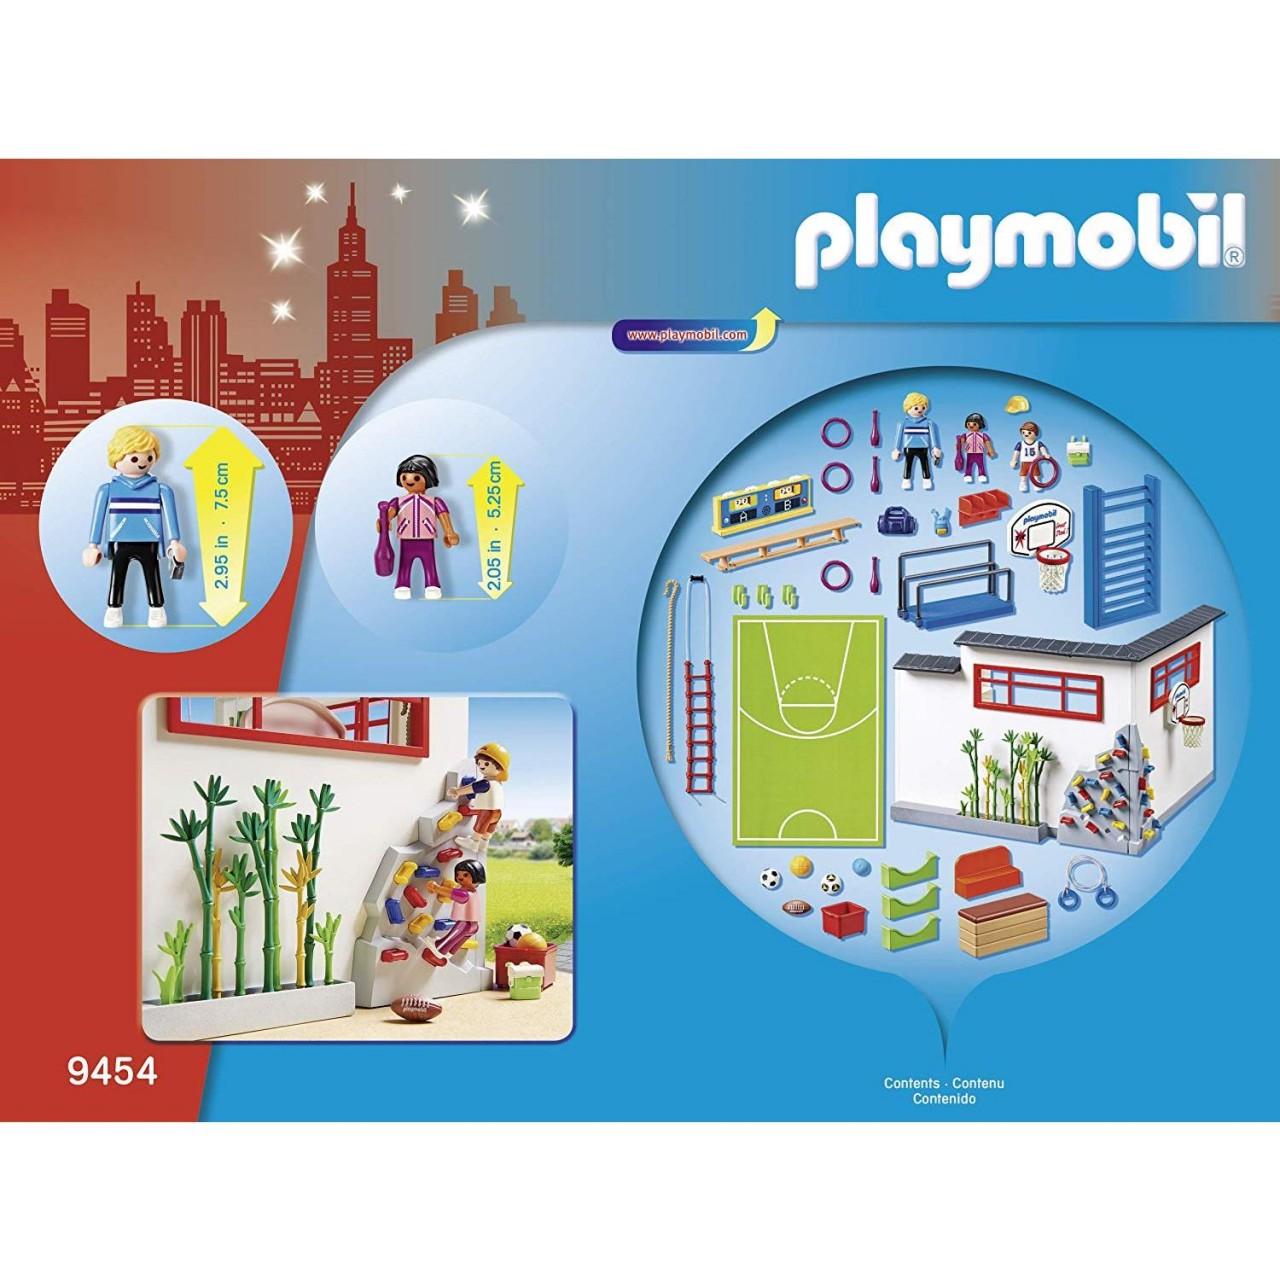 Playmobil 9454 Turnhalle